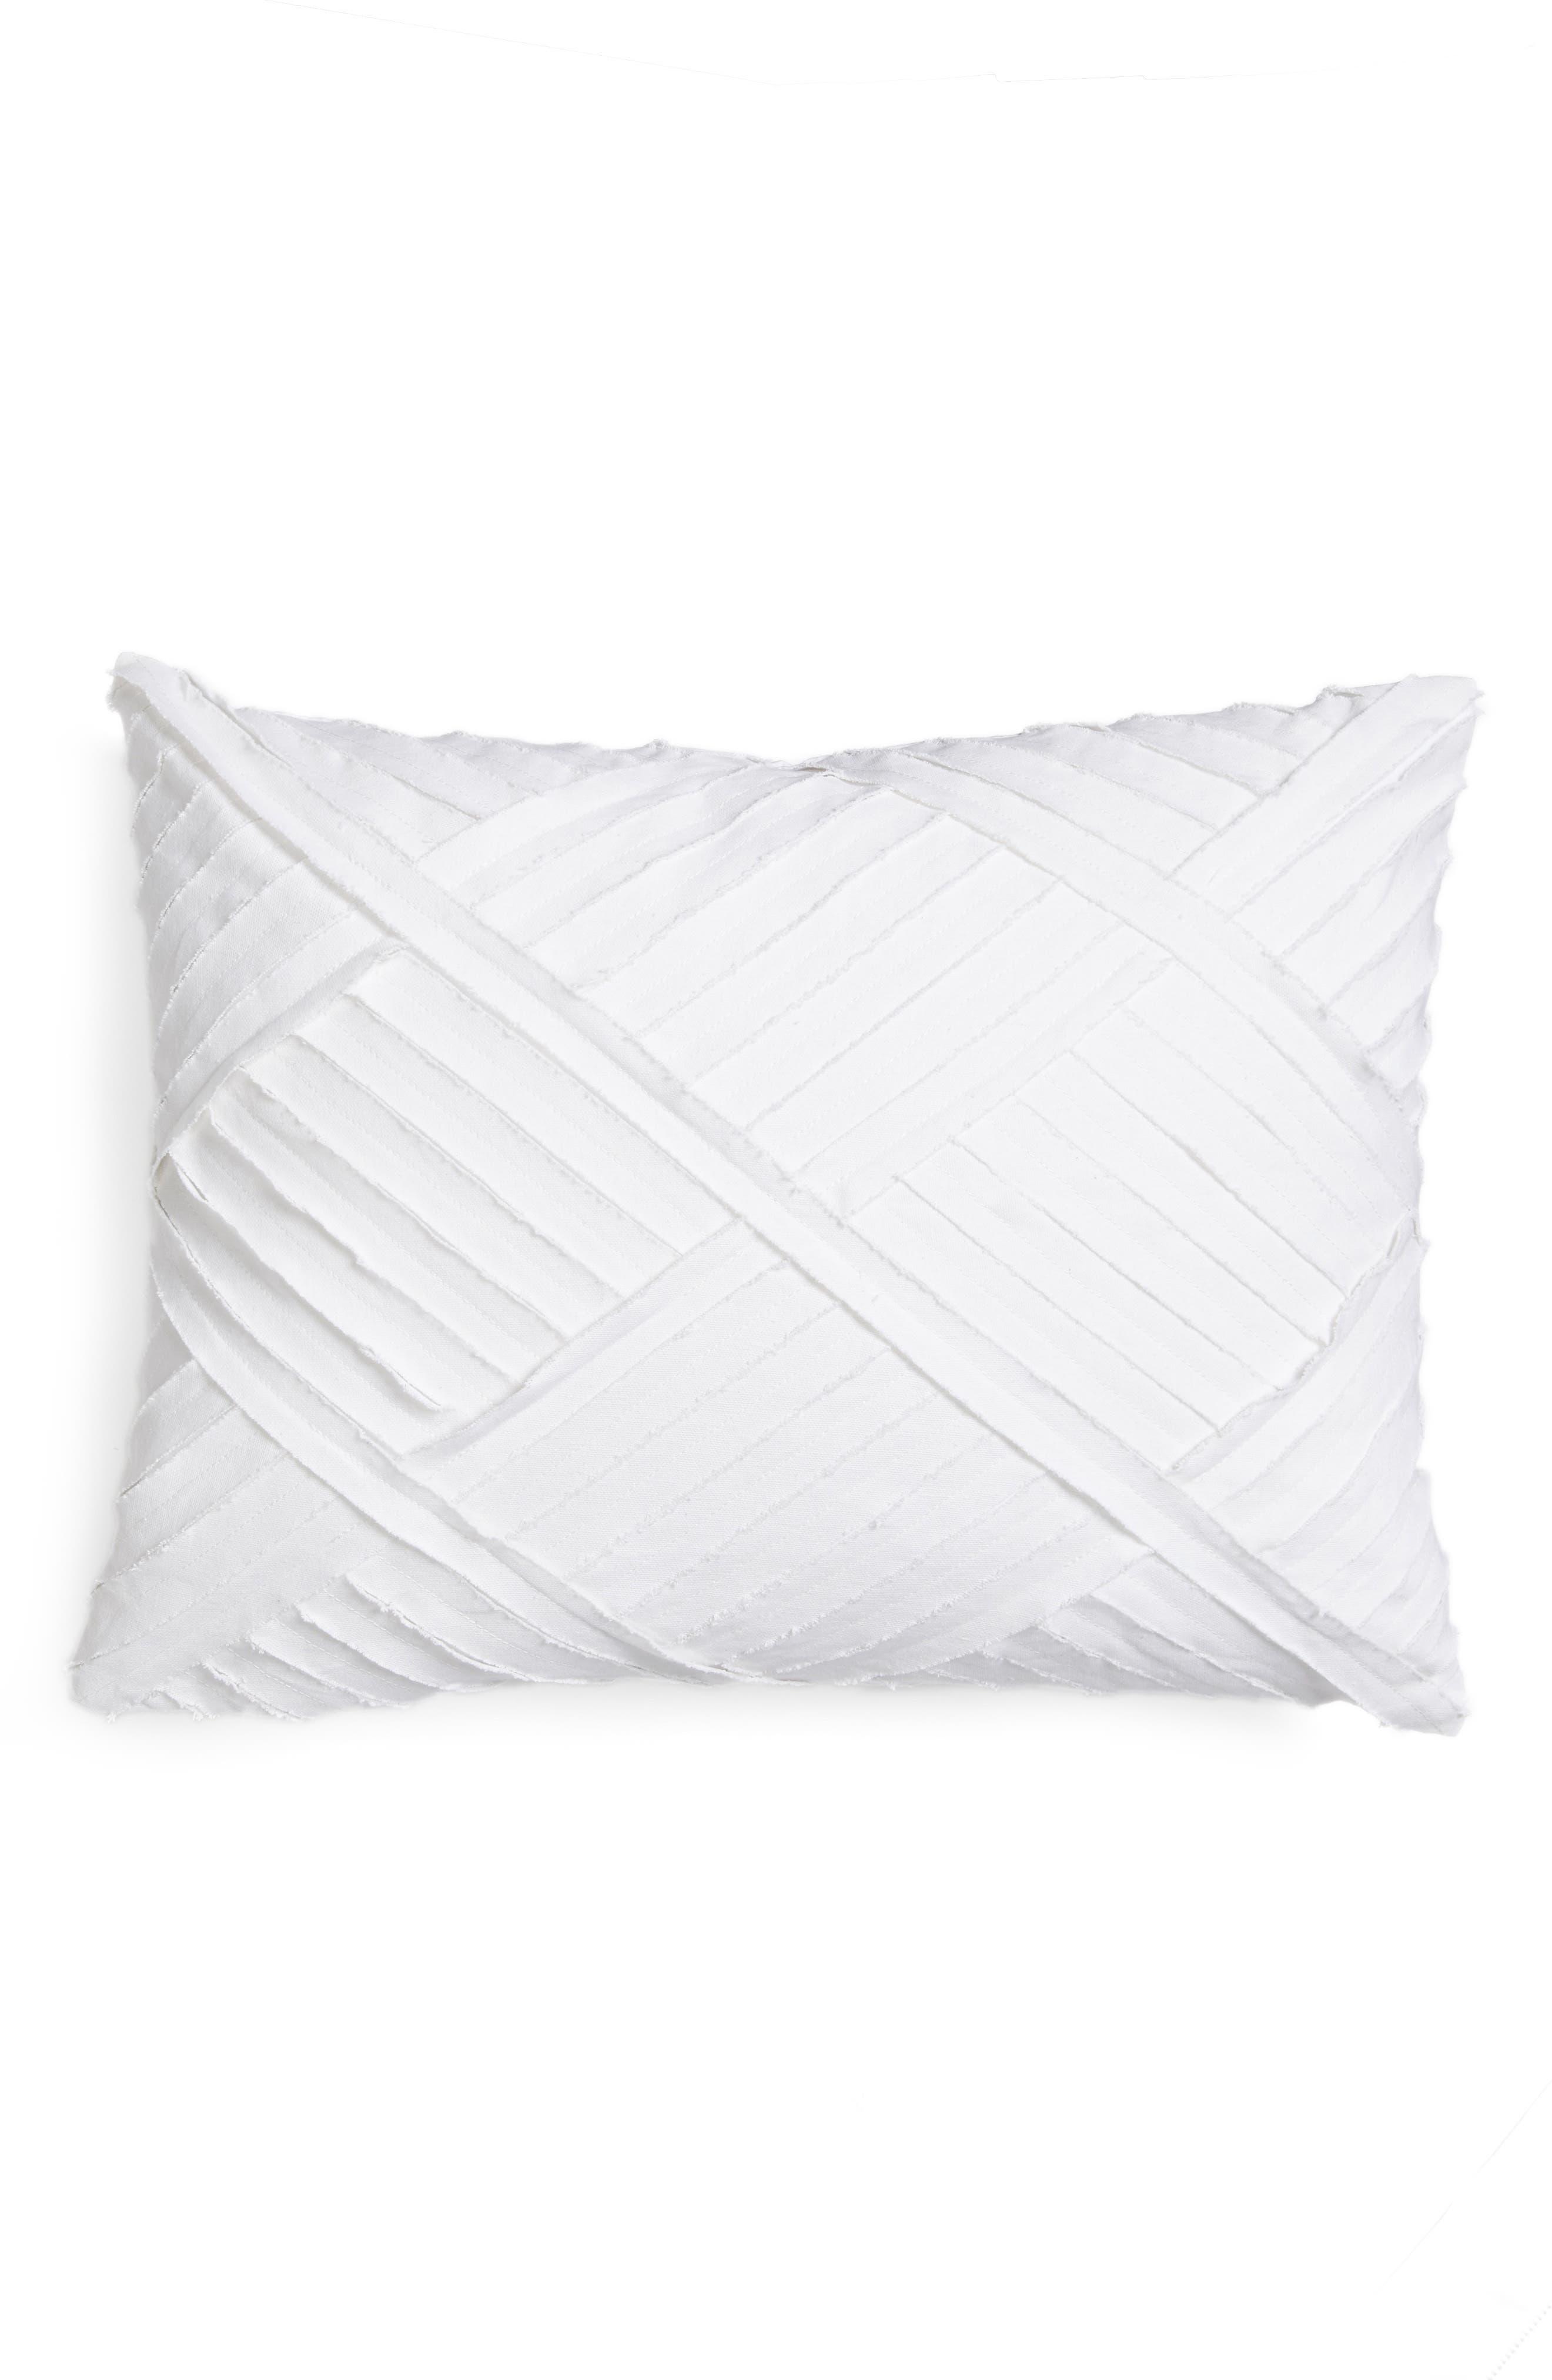 Alexandria Accent Pillow,                             Main thumbnail 1, color,                             100